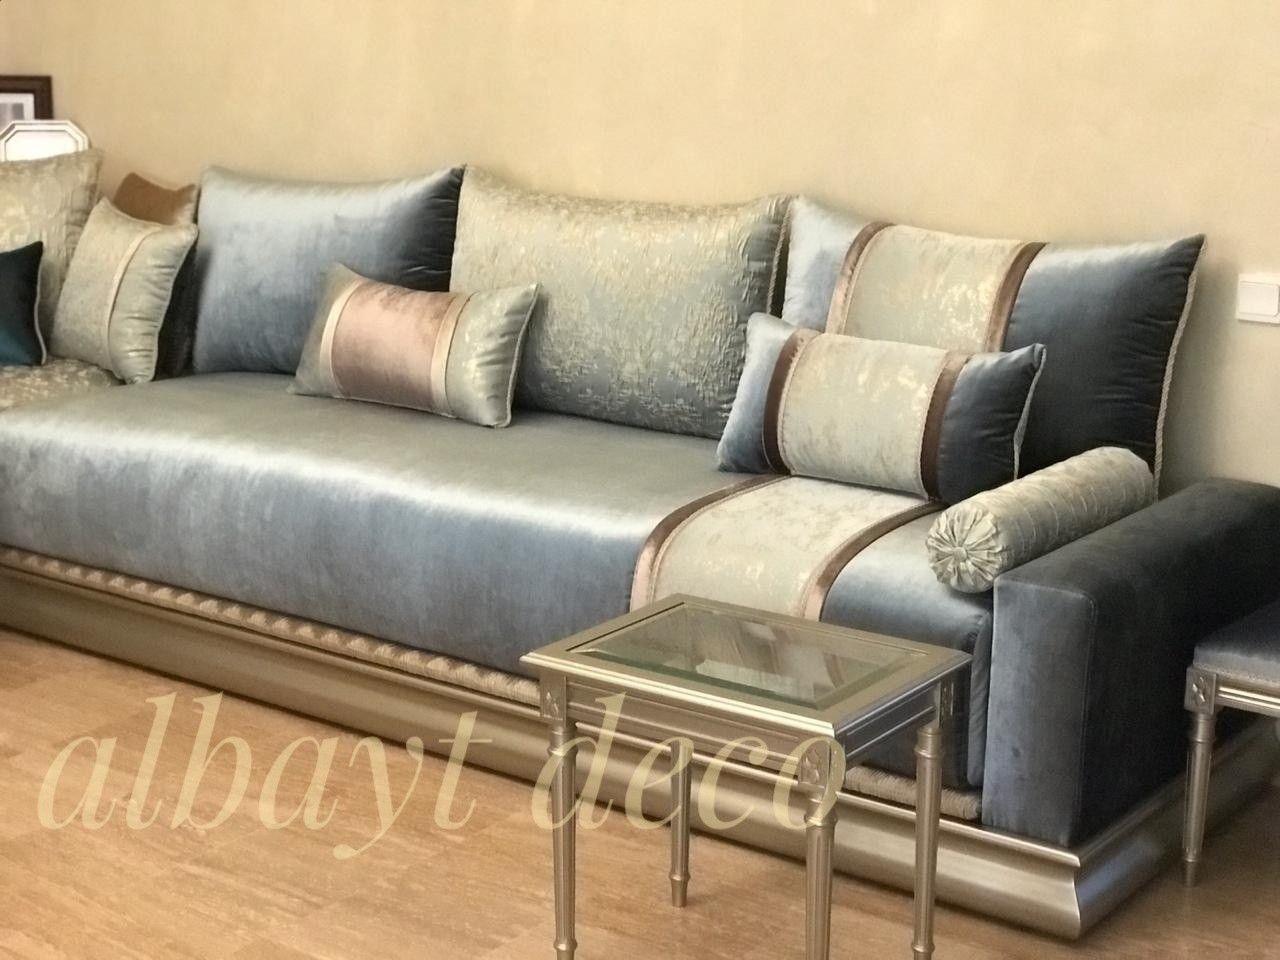 Salon Marocain Living Room Design Inspiration Moroccan Living Room Moroccan Decor Living Room